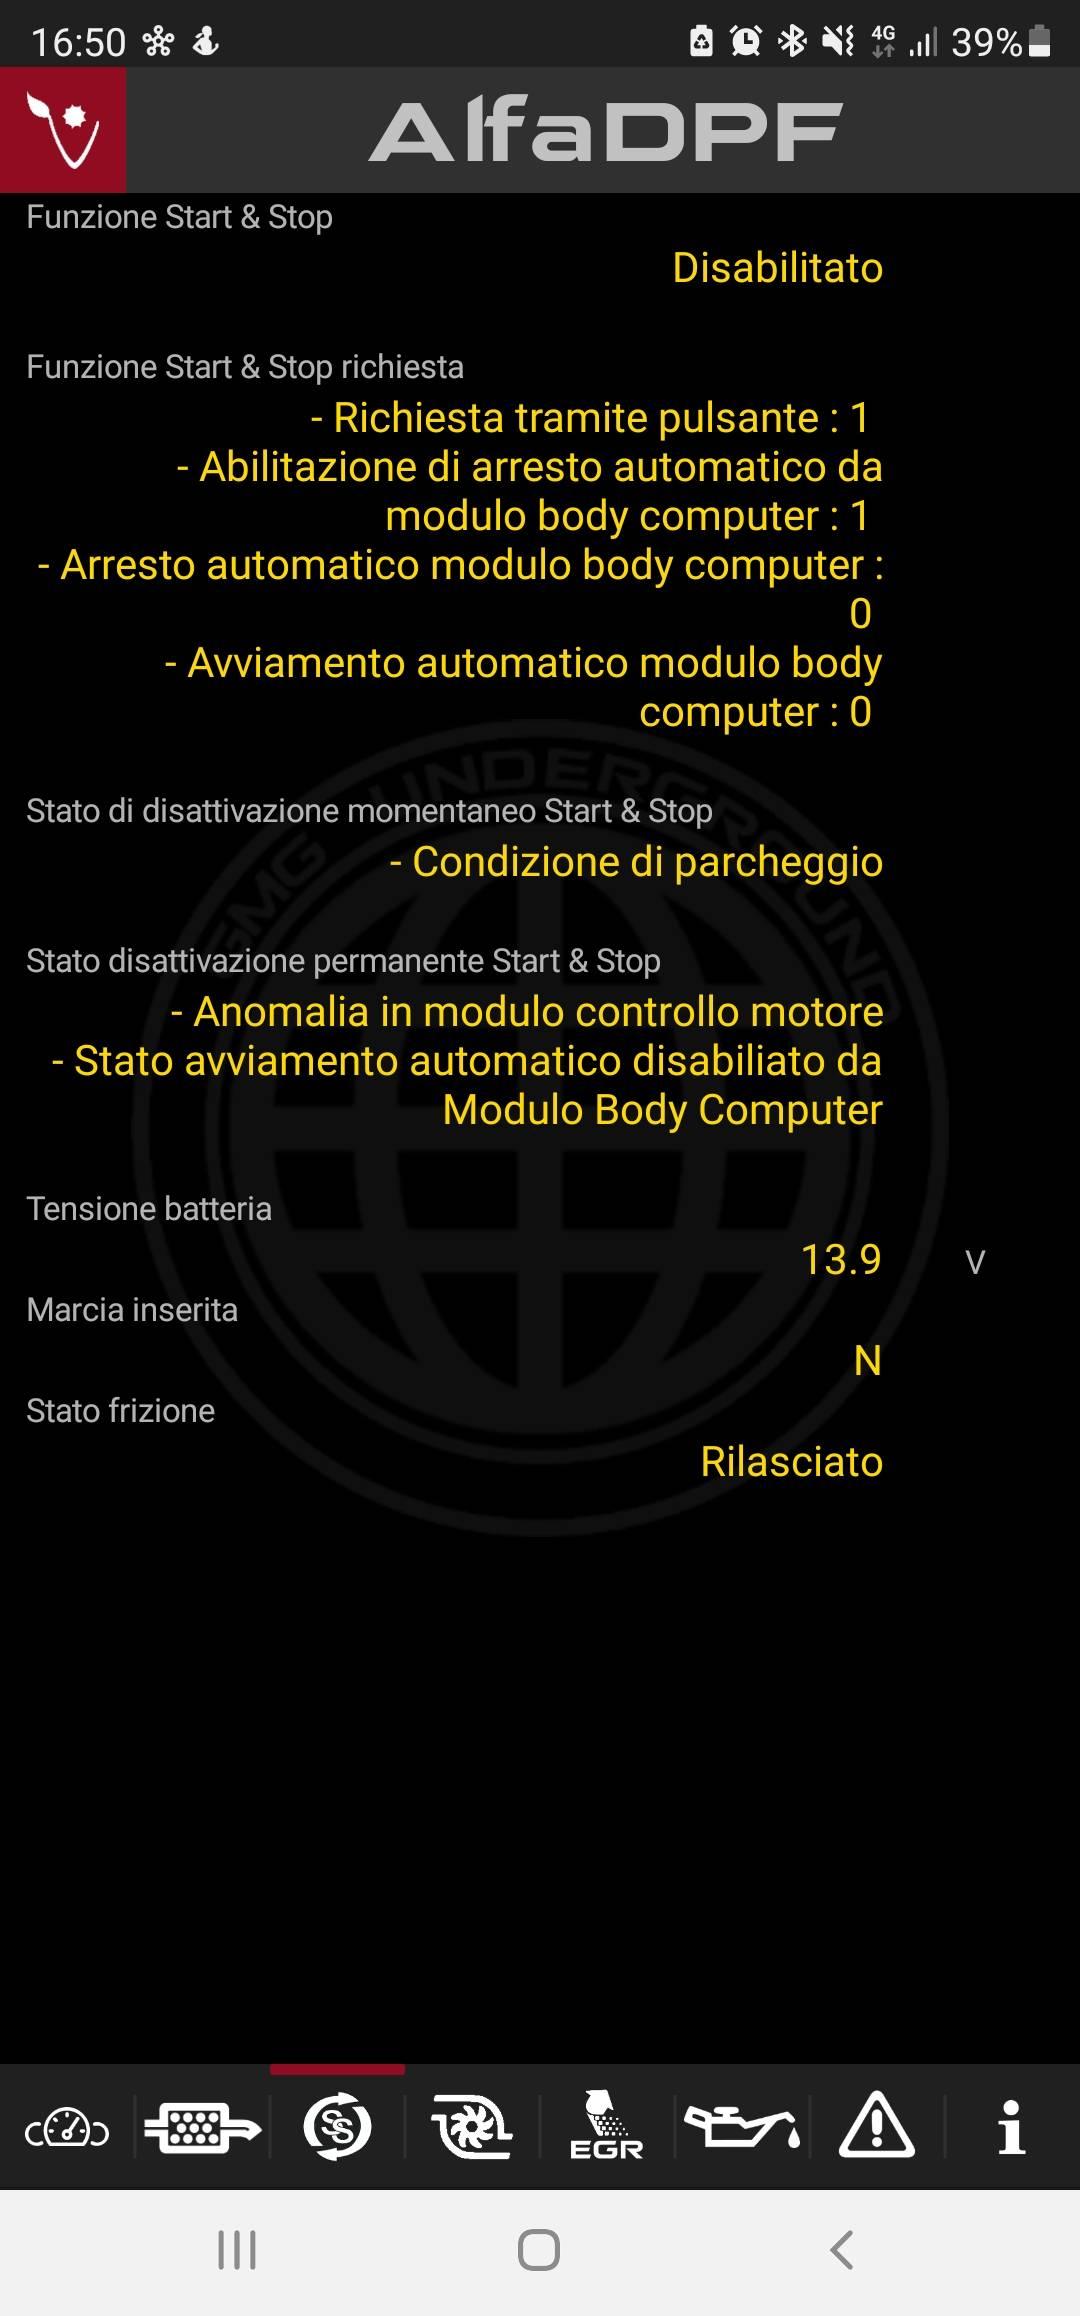 Screenshot_20210720-165019_AlfaDPF.jpg